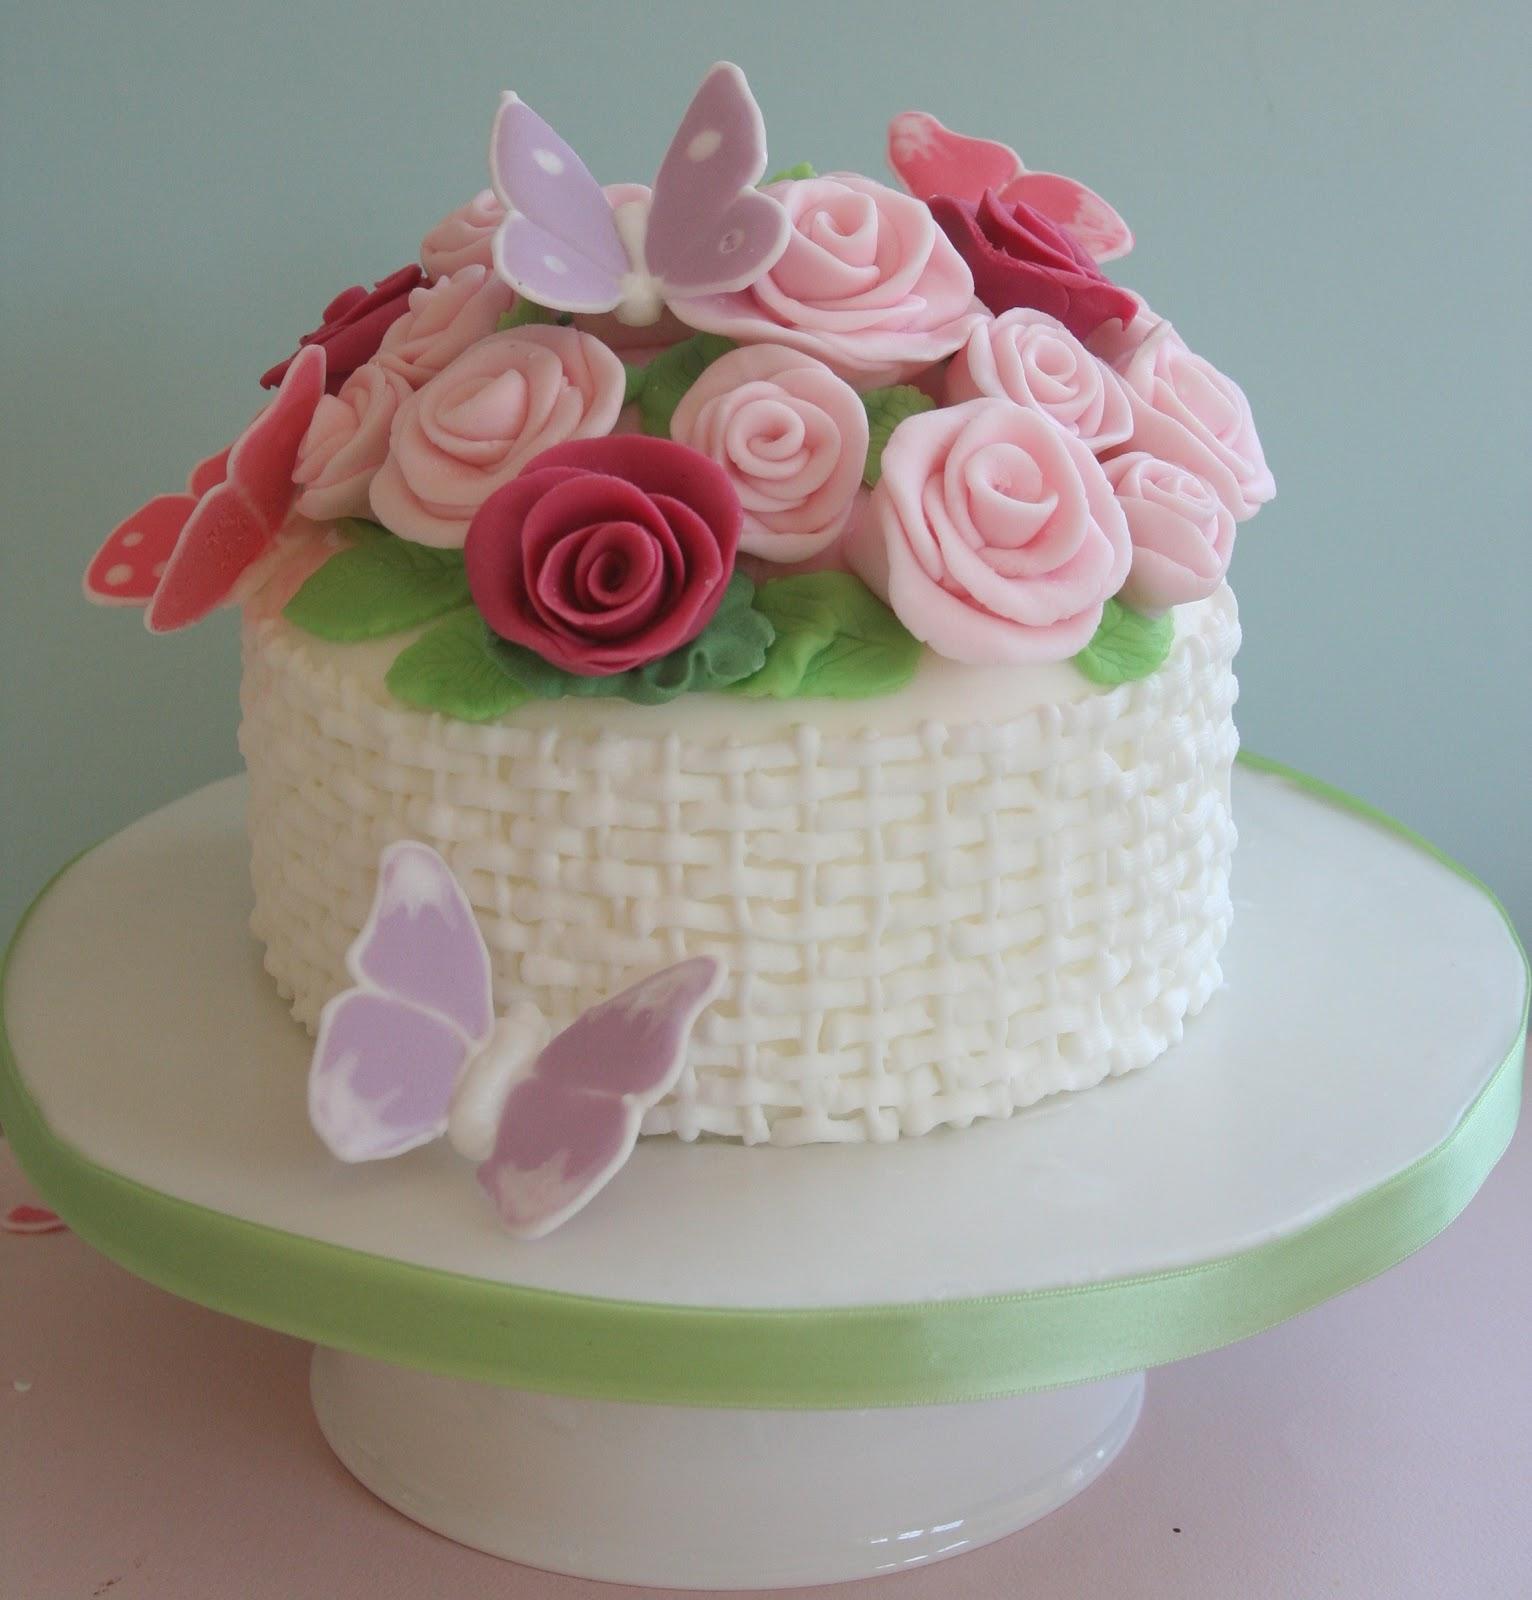 Lemon Tree Bakery Basket Of Flowers And Butterflies